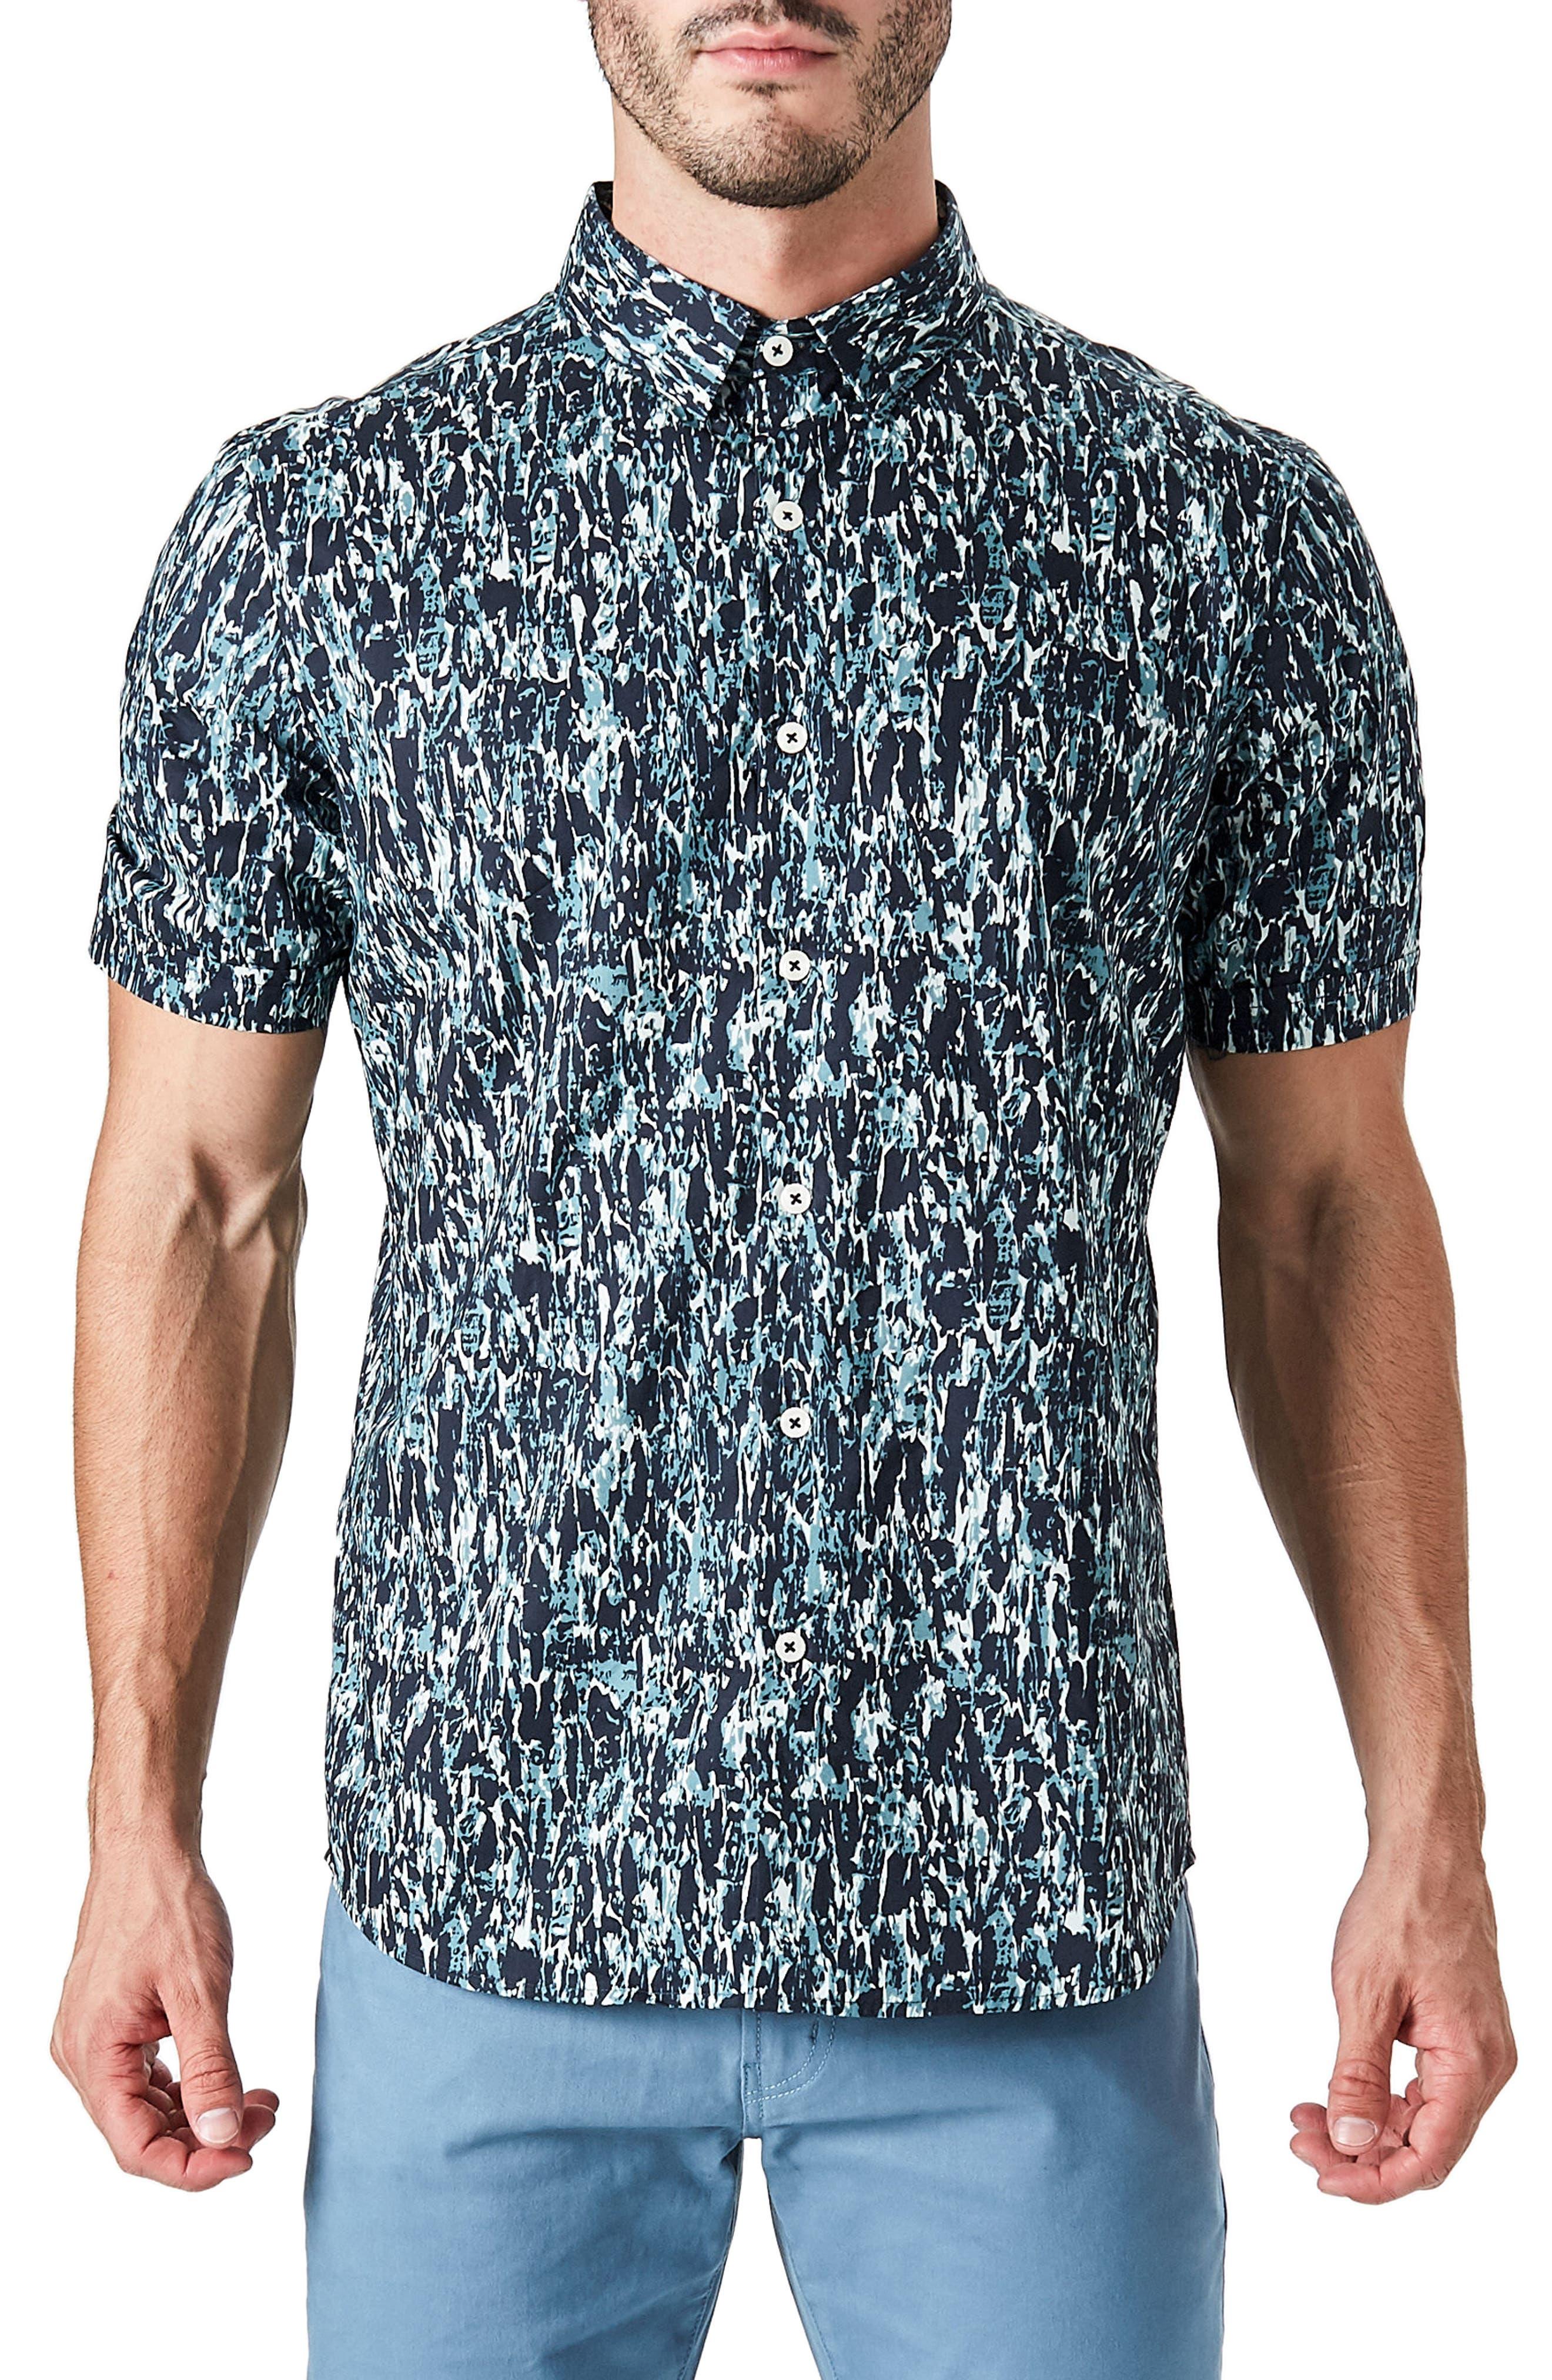 Universal Sound Woven Shirt,                         Main,                         color, MIDNIGHT G